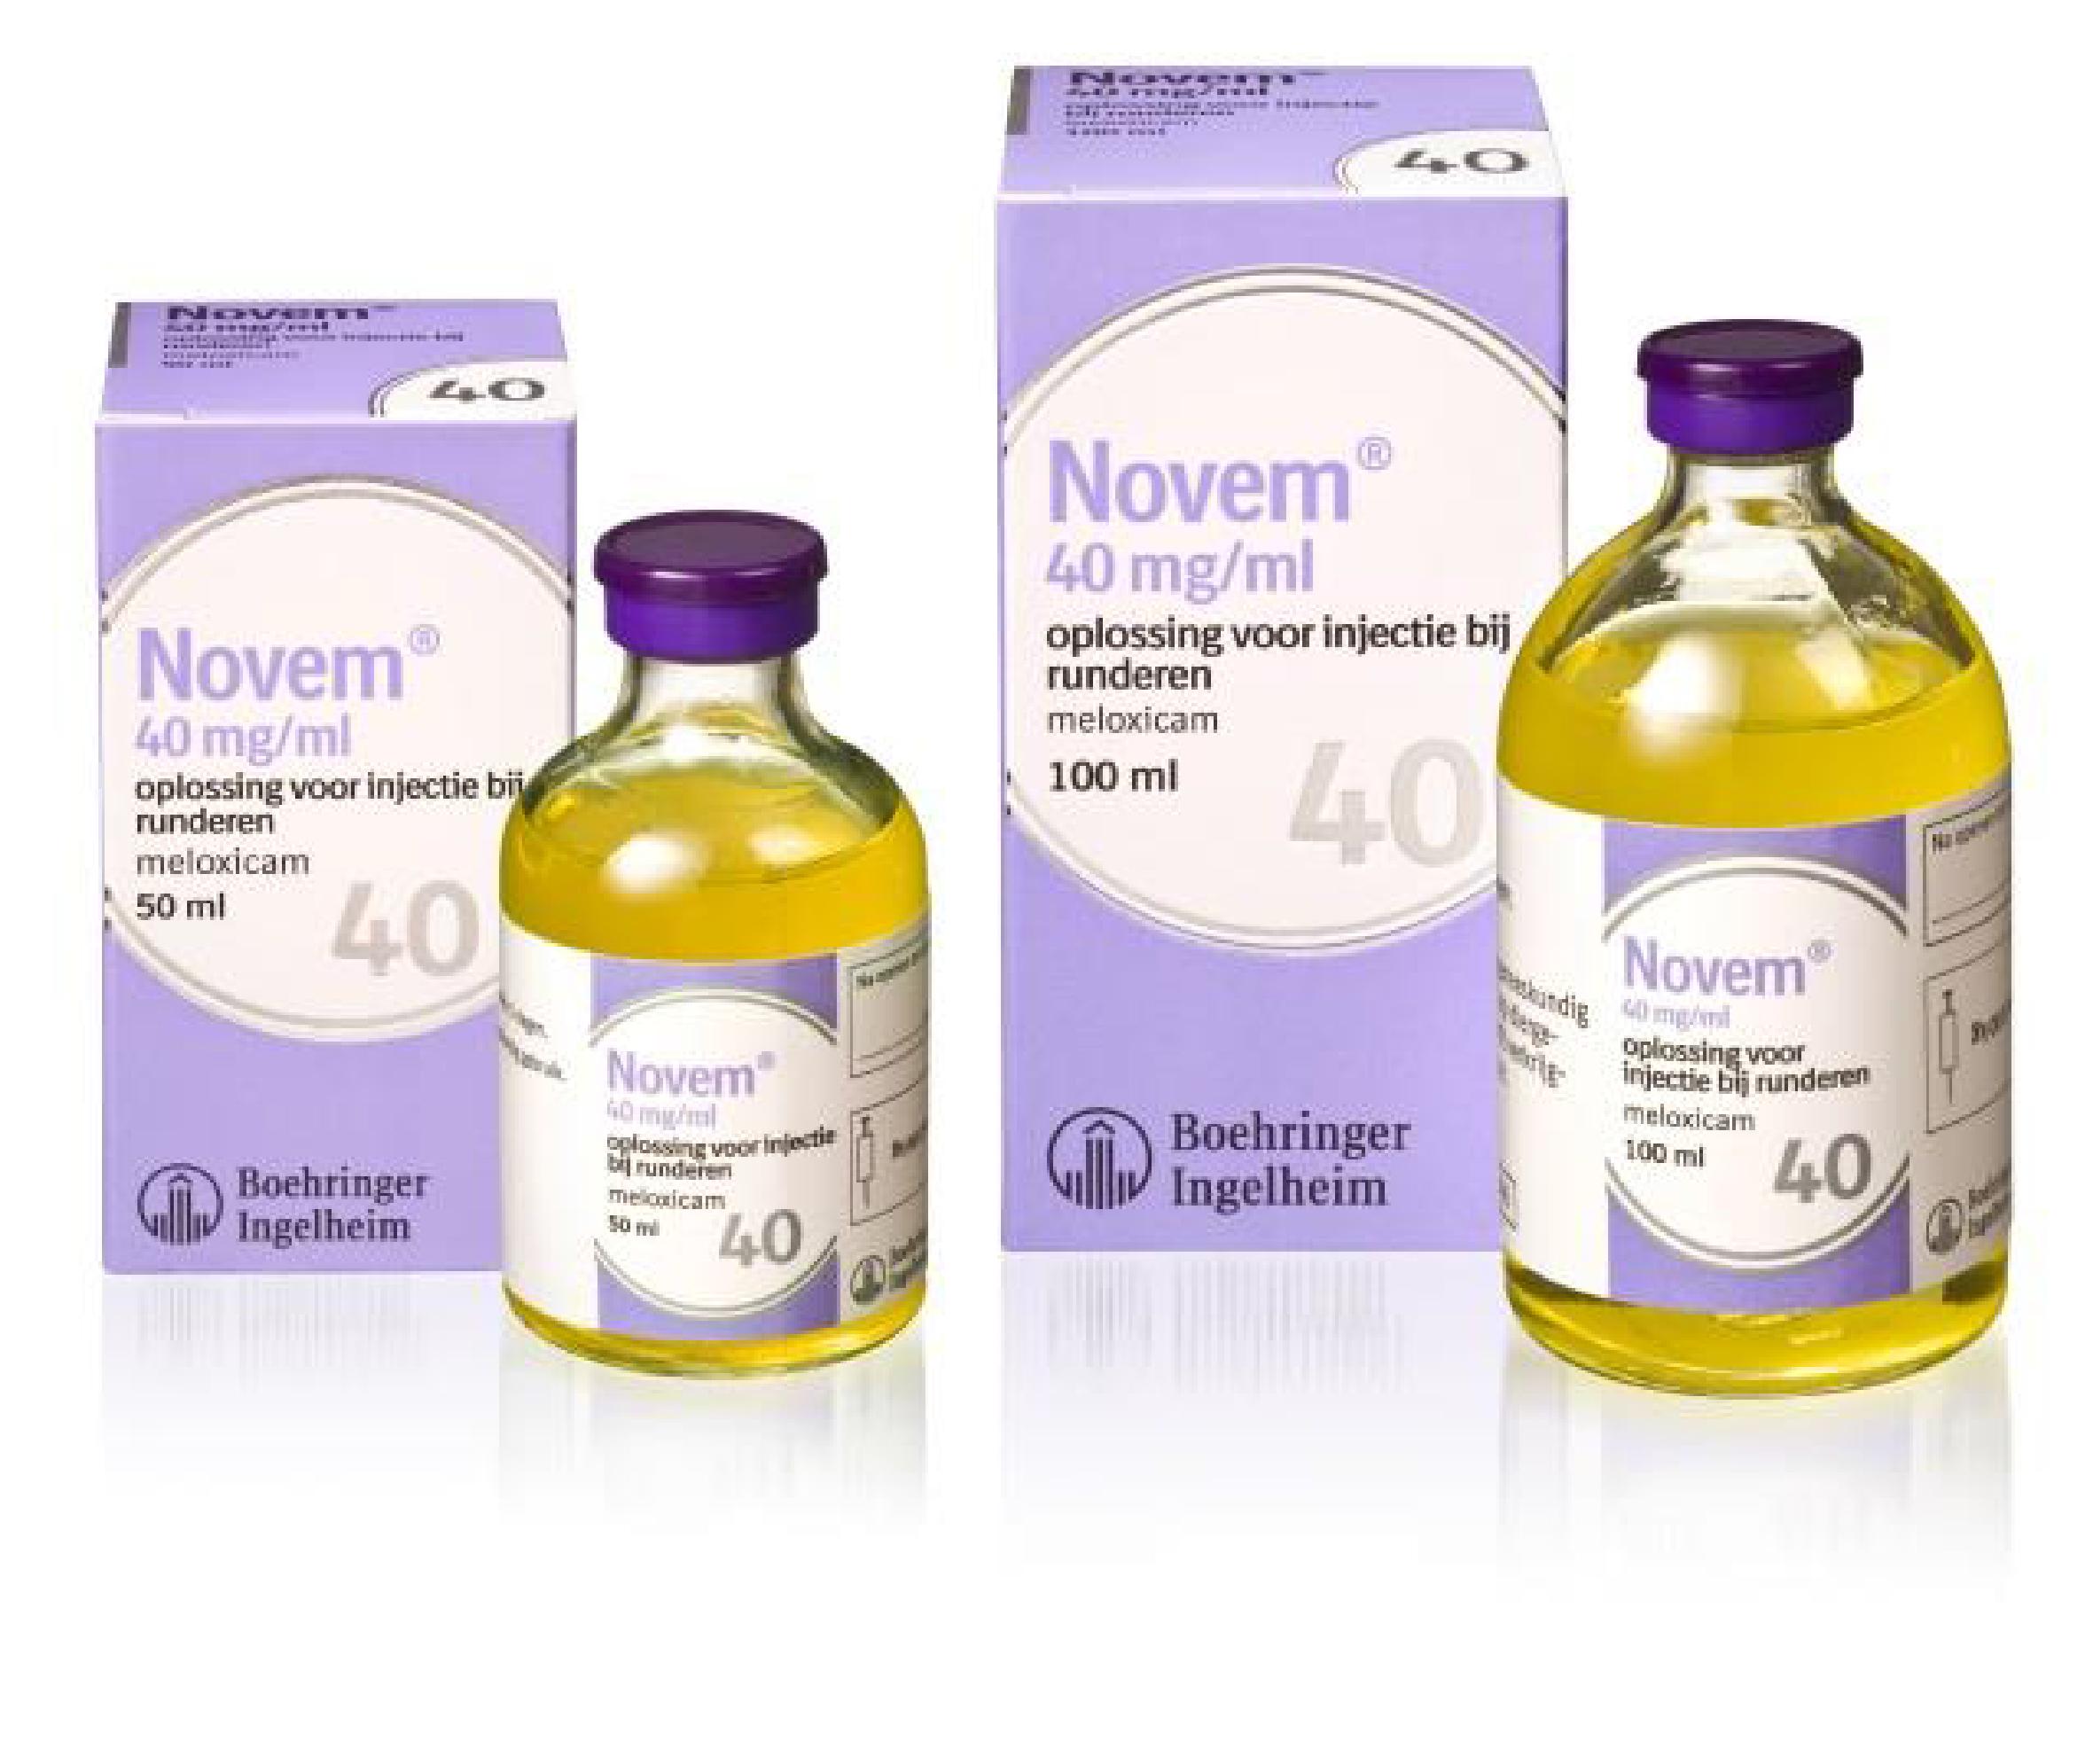 NIEUW - Novem®40 mg/ml